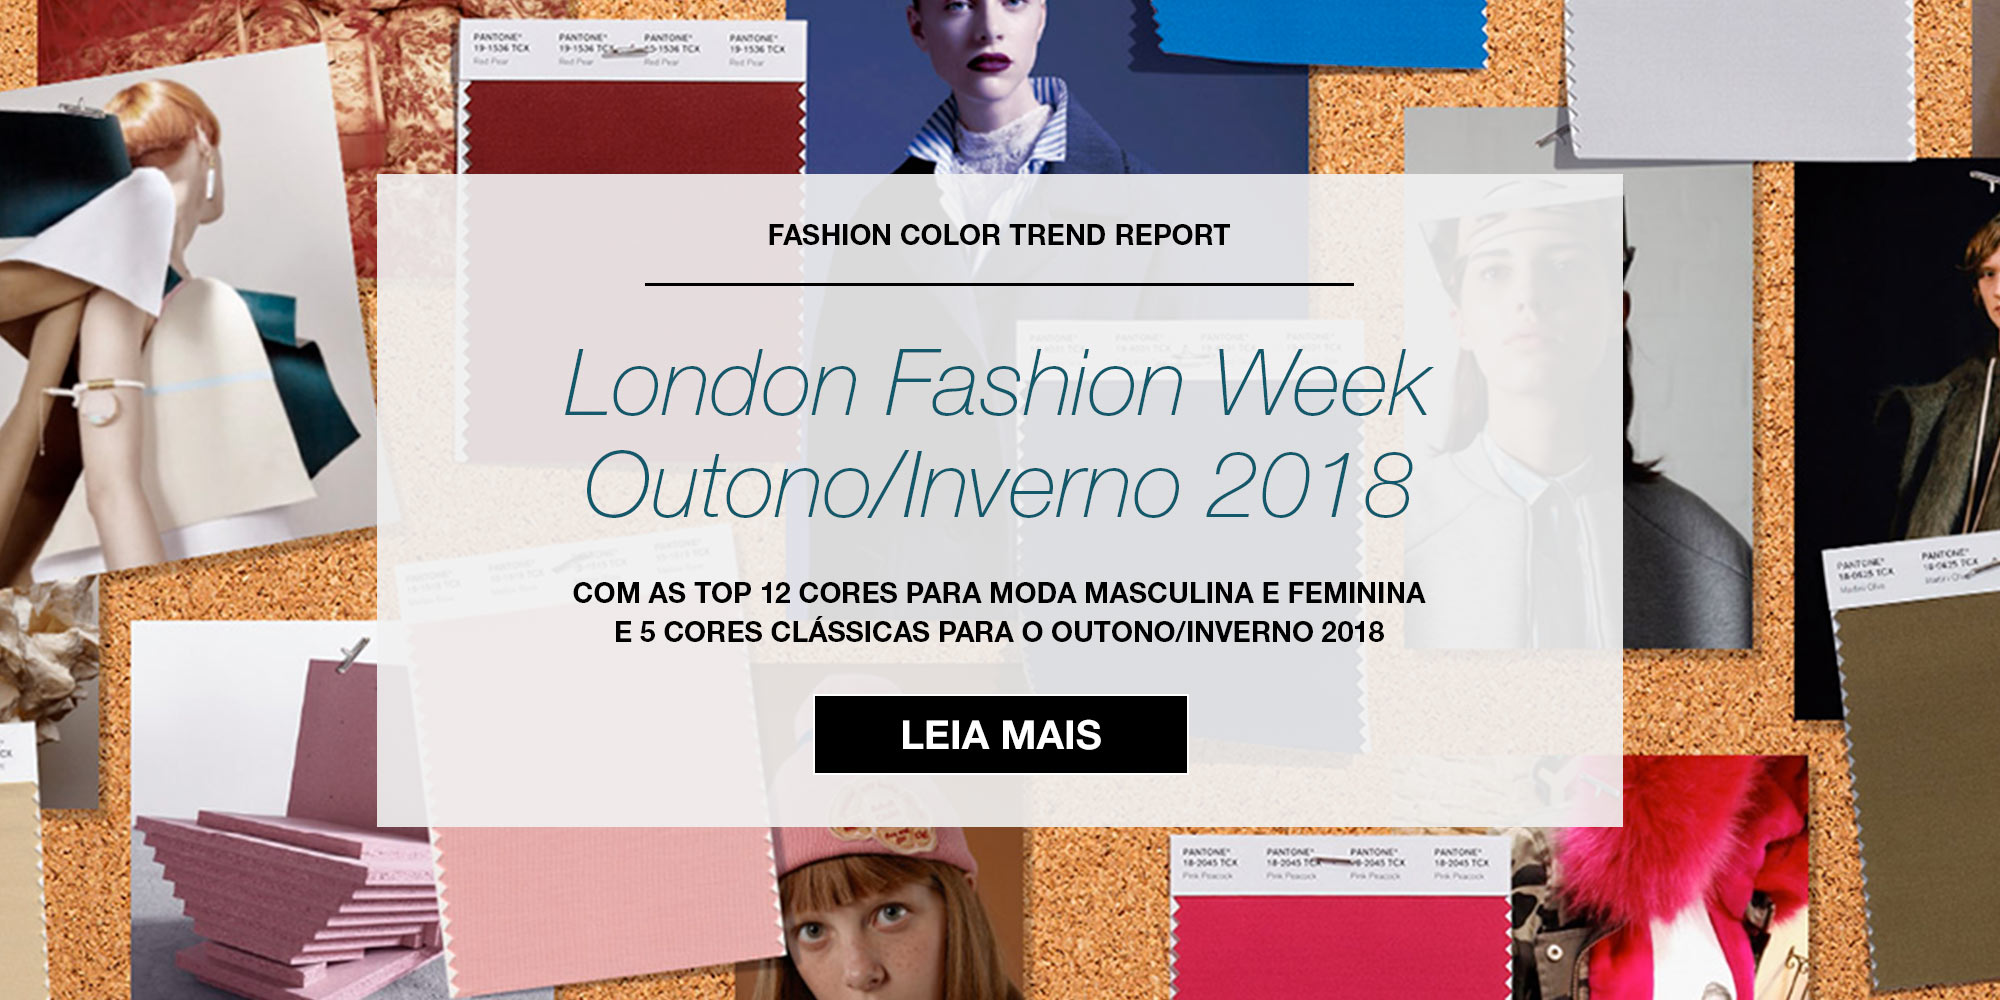 FCR - London Fashion Week Outono Inverno 2018